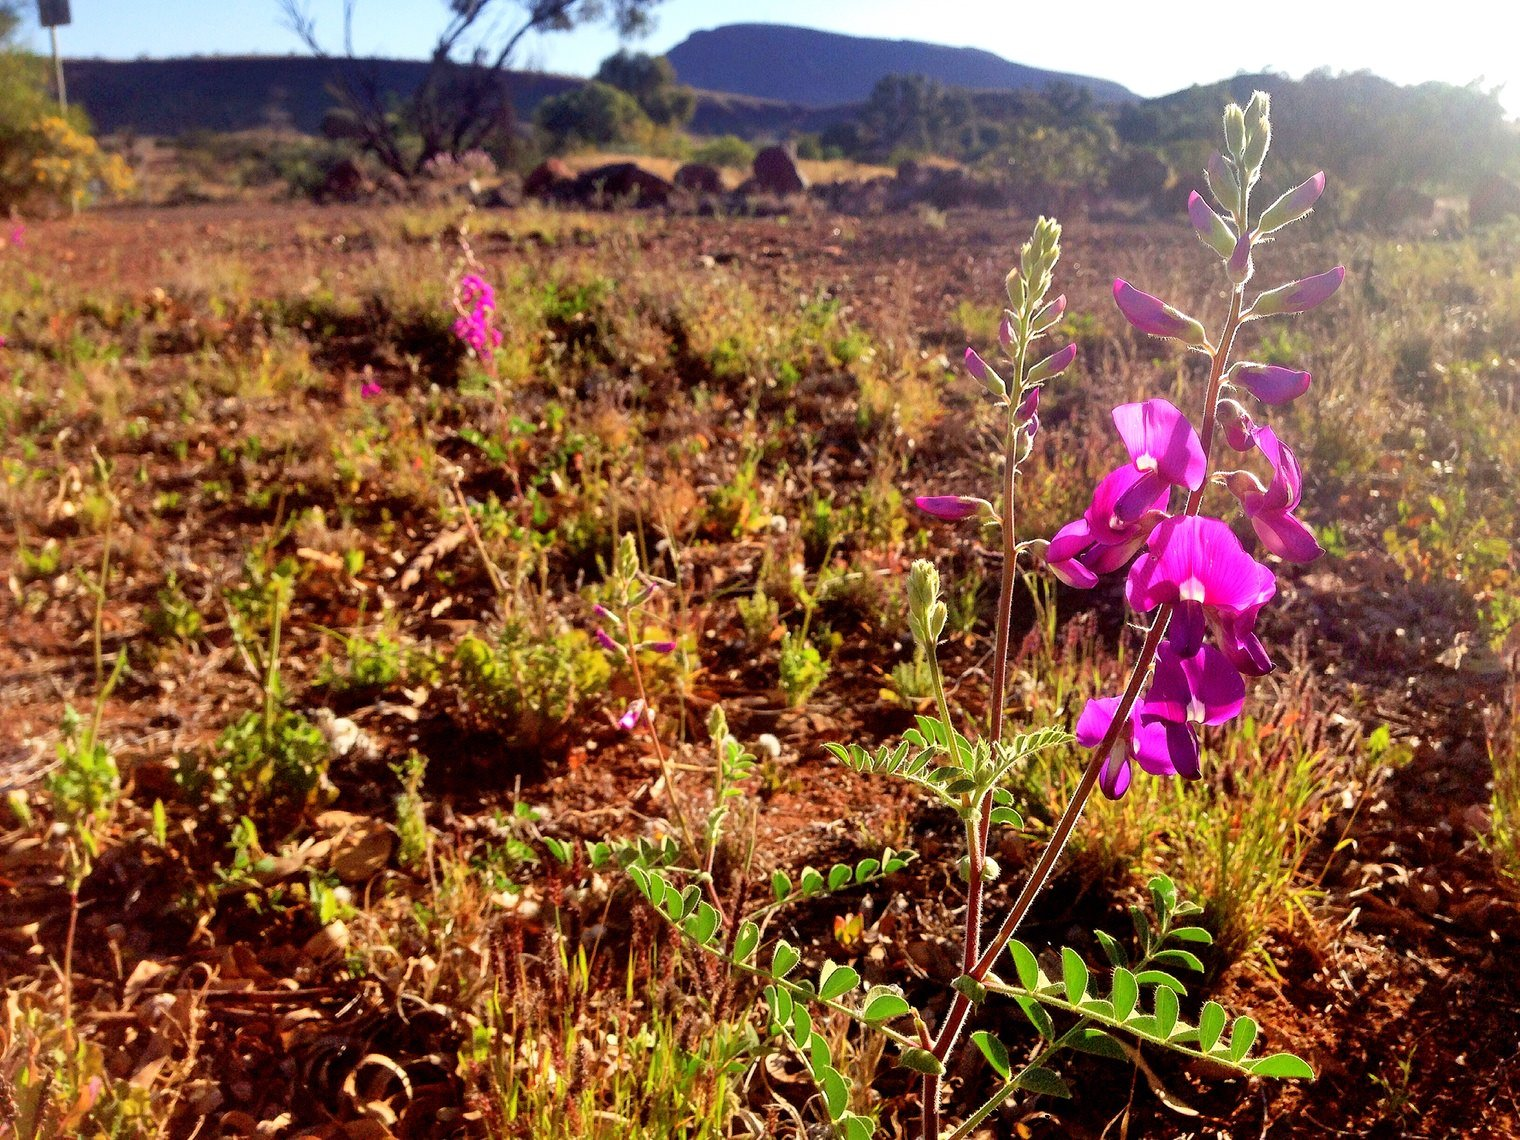 Wildflowers in Pilabara, Western Australia